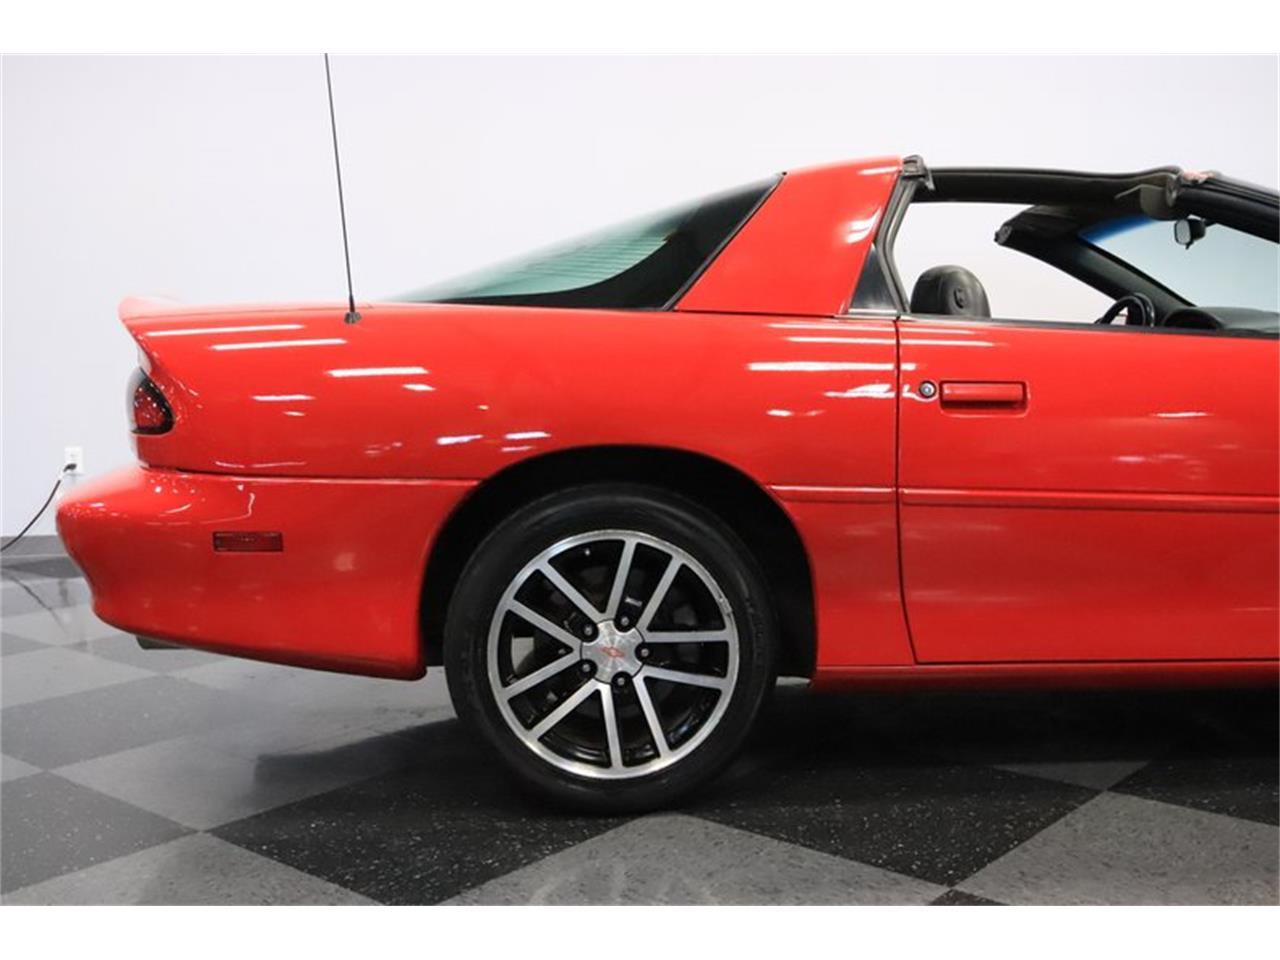 2002 Chevrolet Camaro (CC-1217034) for sale in Mesa, Arizona